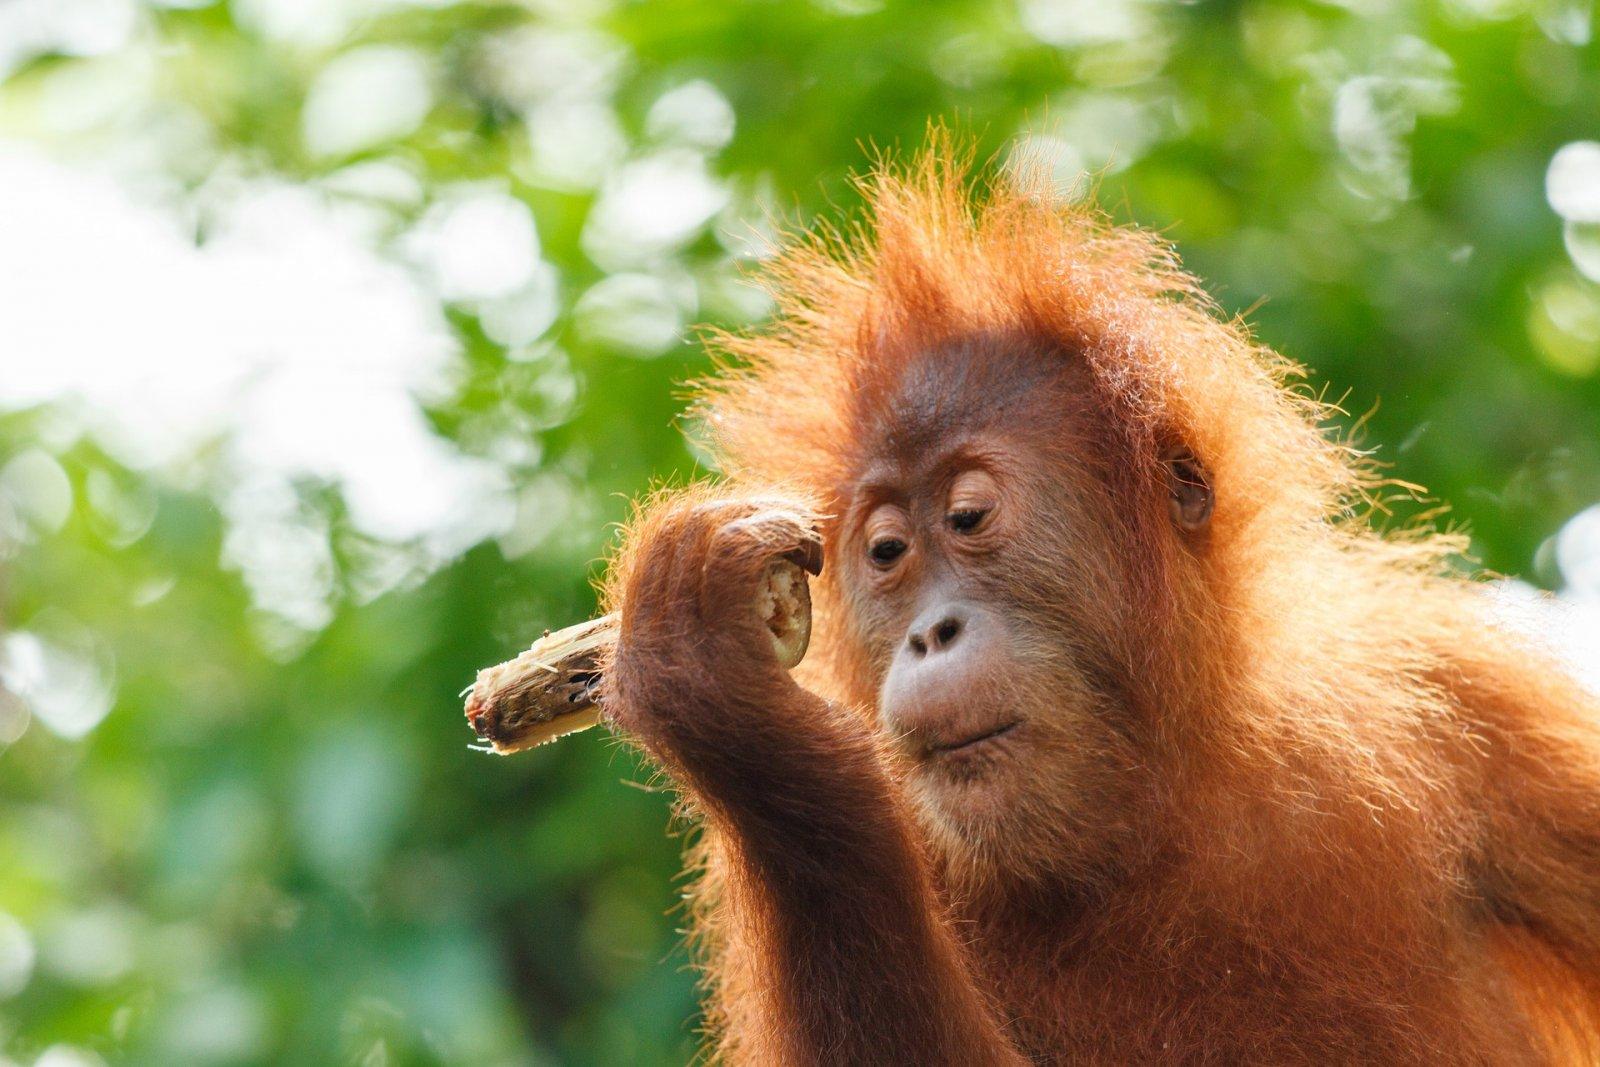 Una cria d'orangutan de Borneo